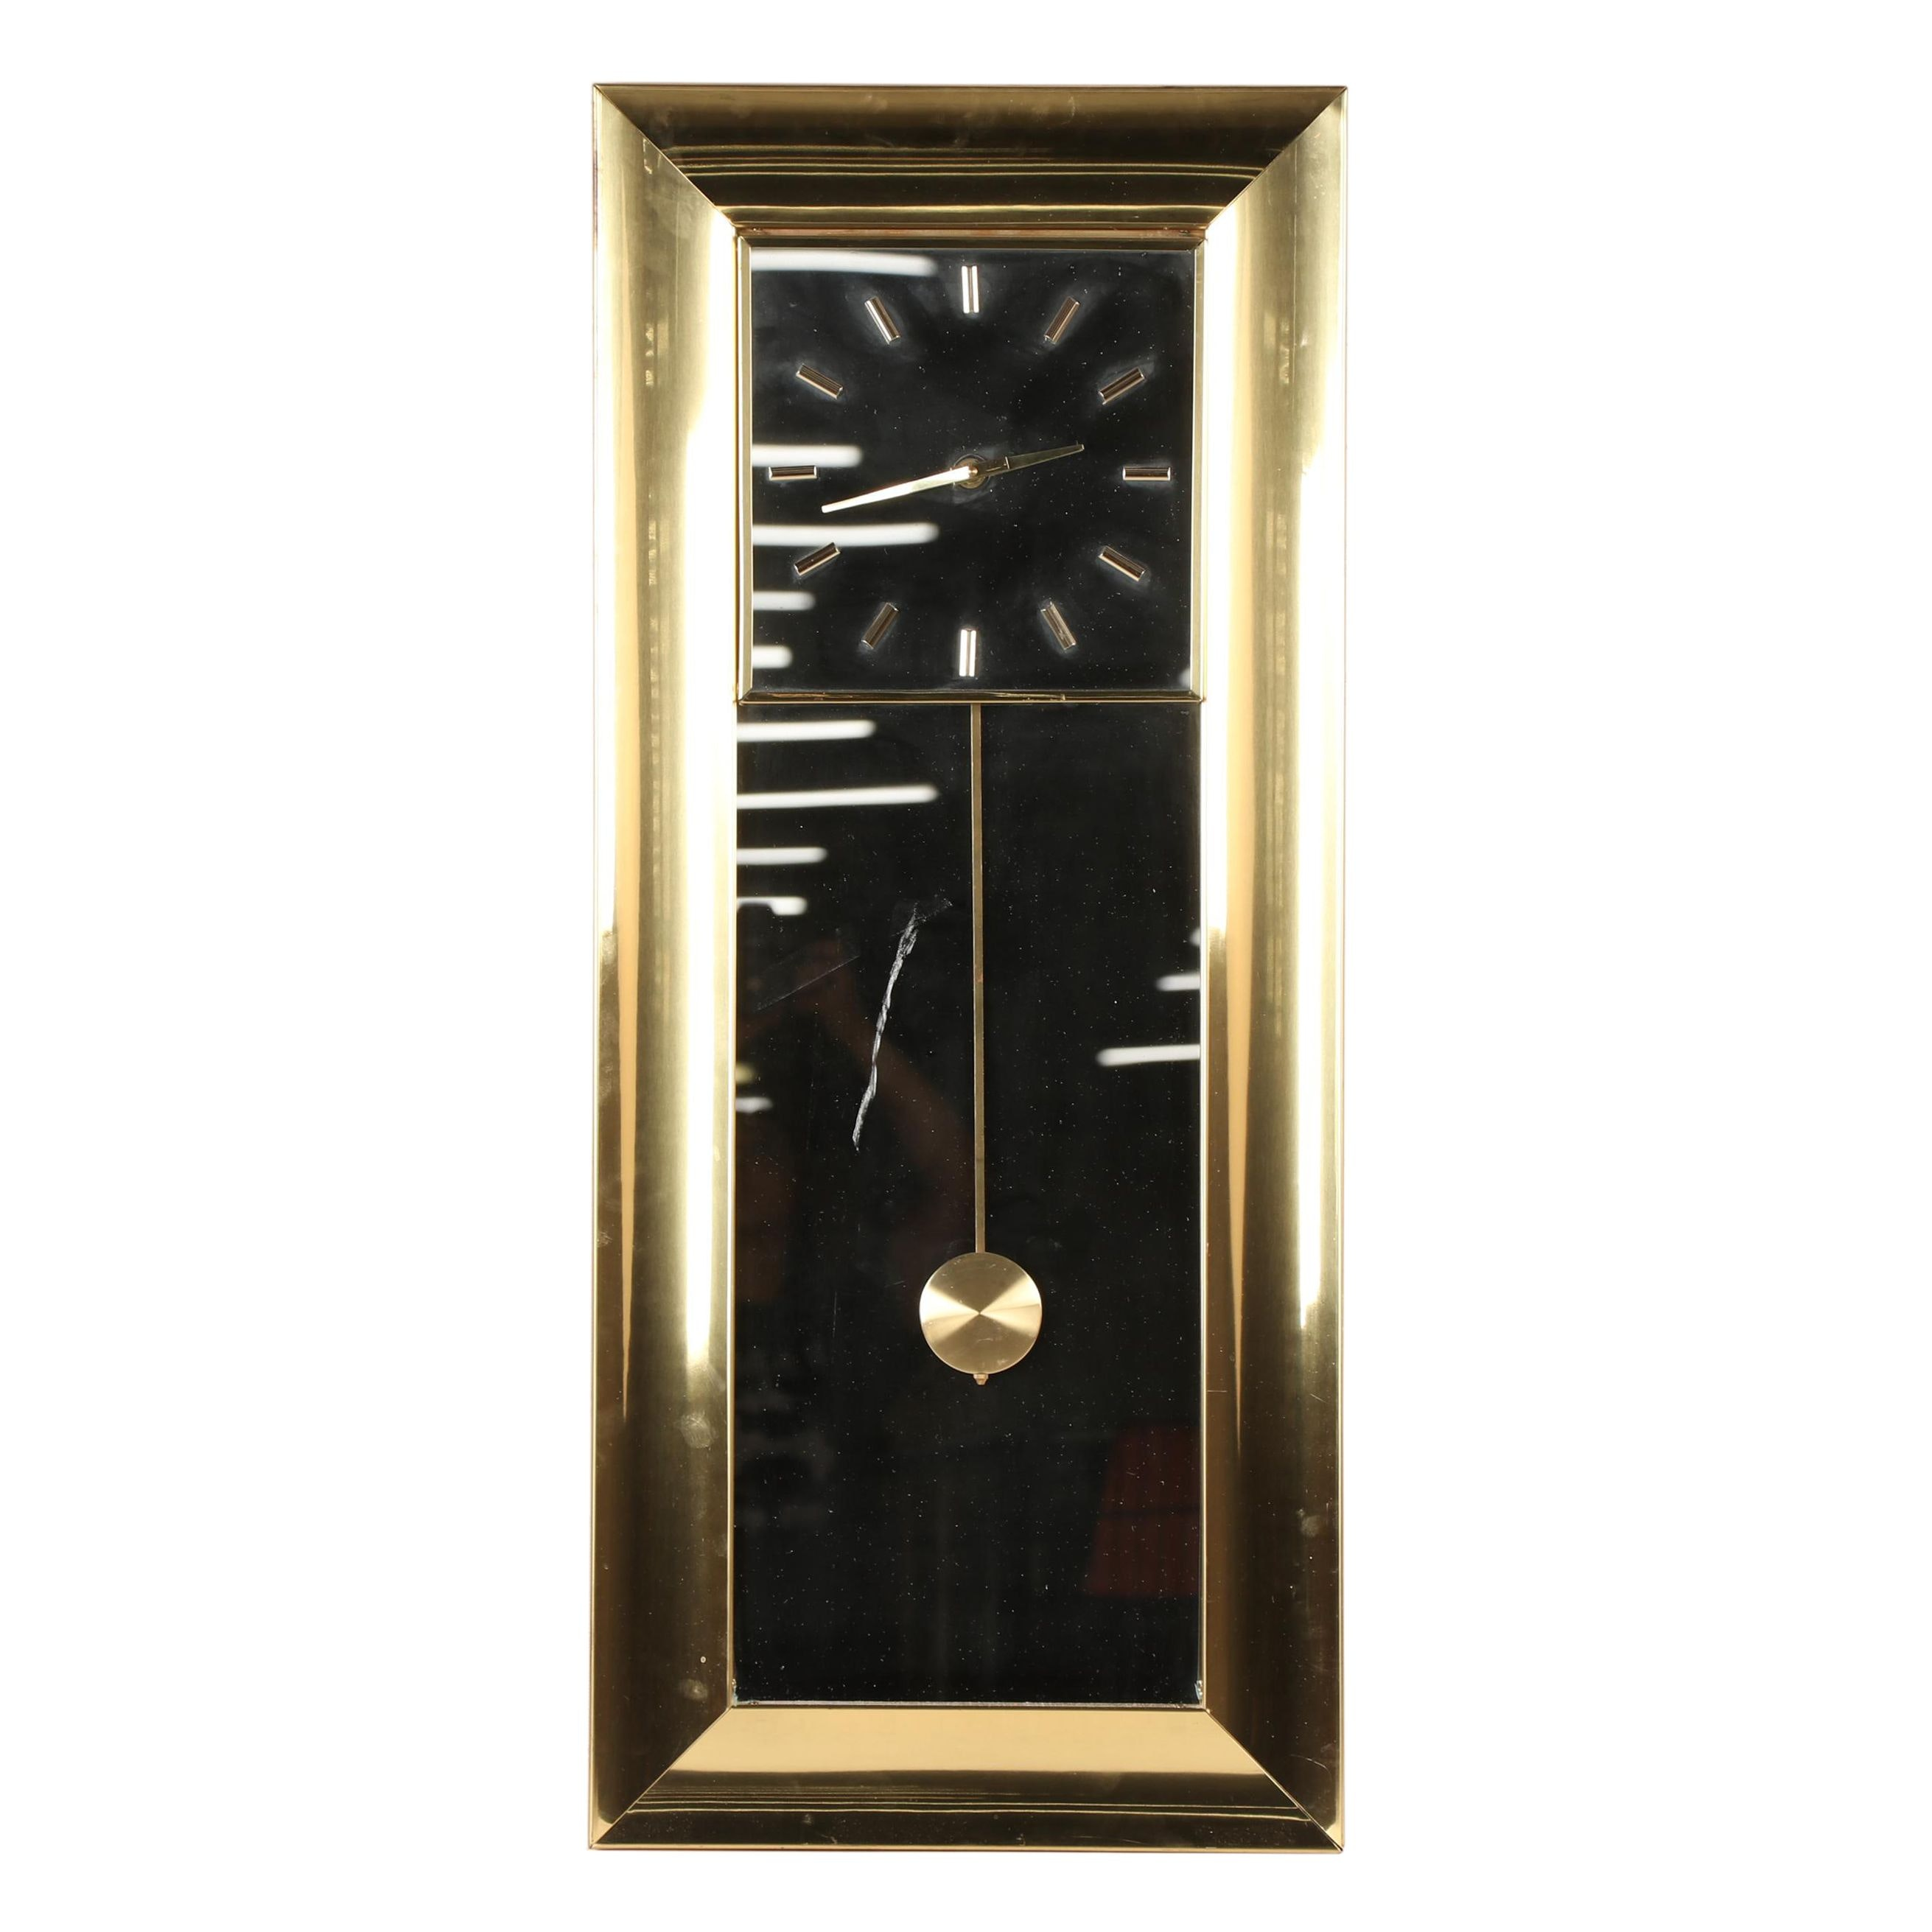 Brass Pendulum Wall Clock, Circa 1970